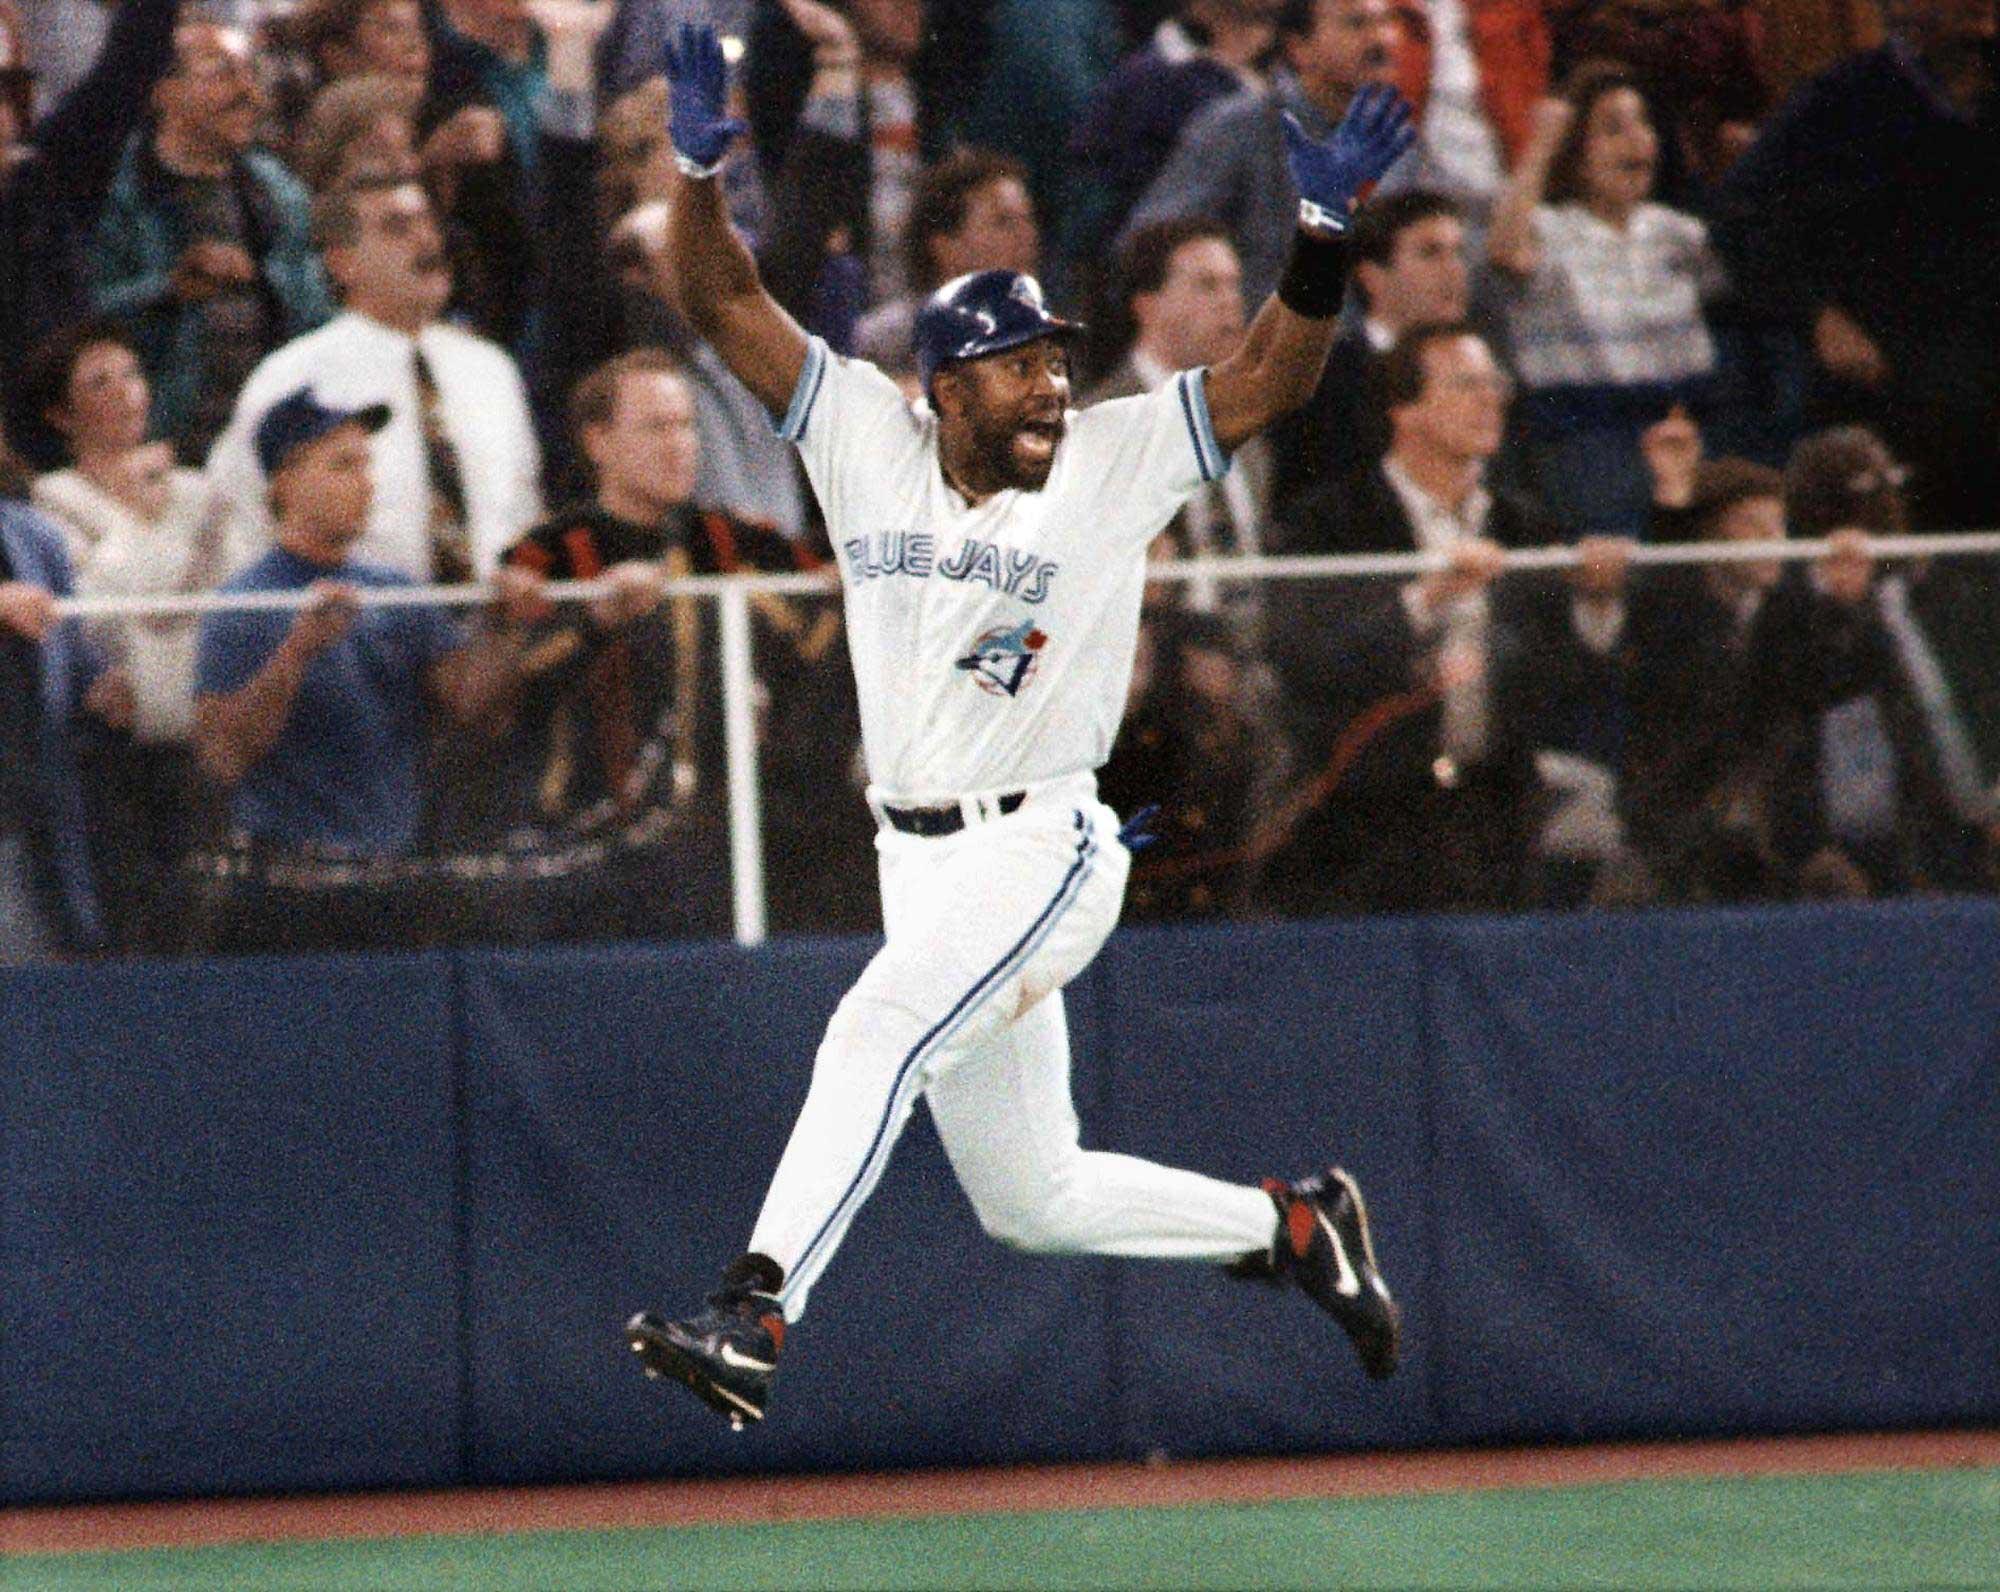 Toronto Blue Jays' Joe Carter celebrates his game winning three-run homerun in the ninth inning of game 6 of the World Series in Toronto, on Oct. 23, 1993.